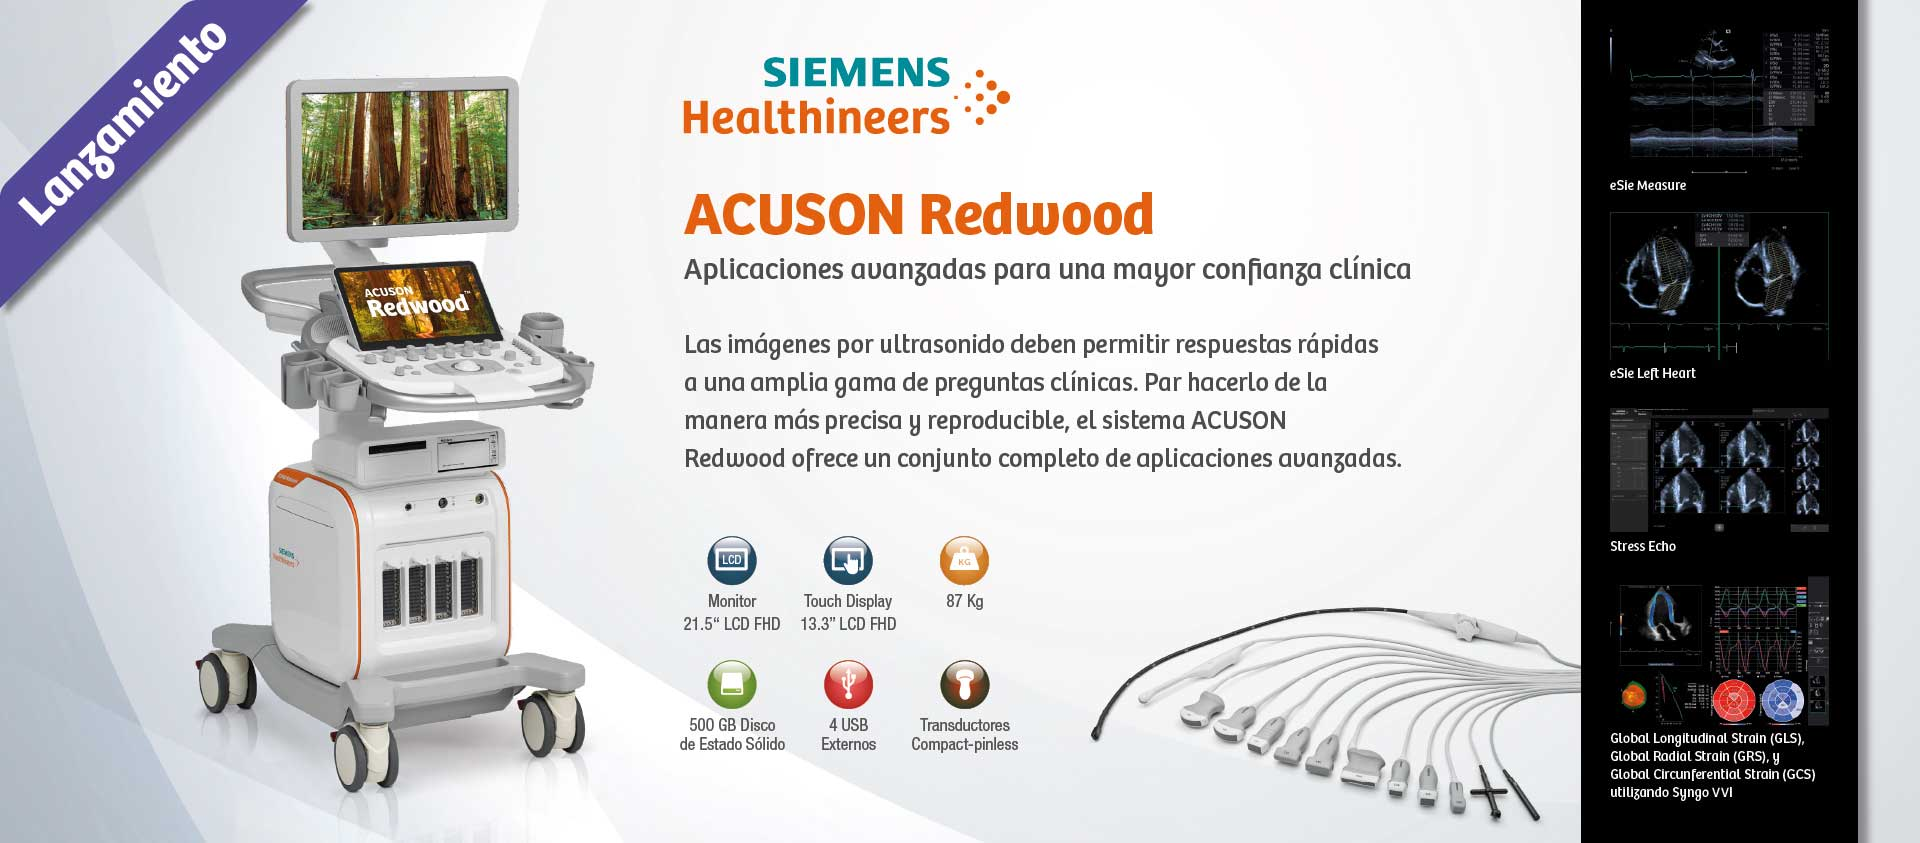 Siemens Acuson Redwood